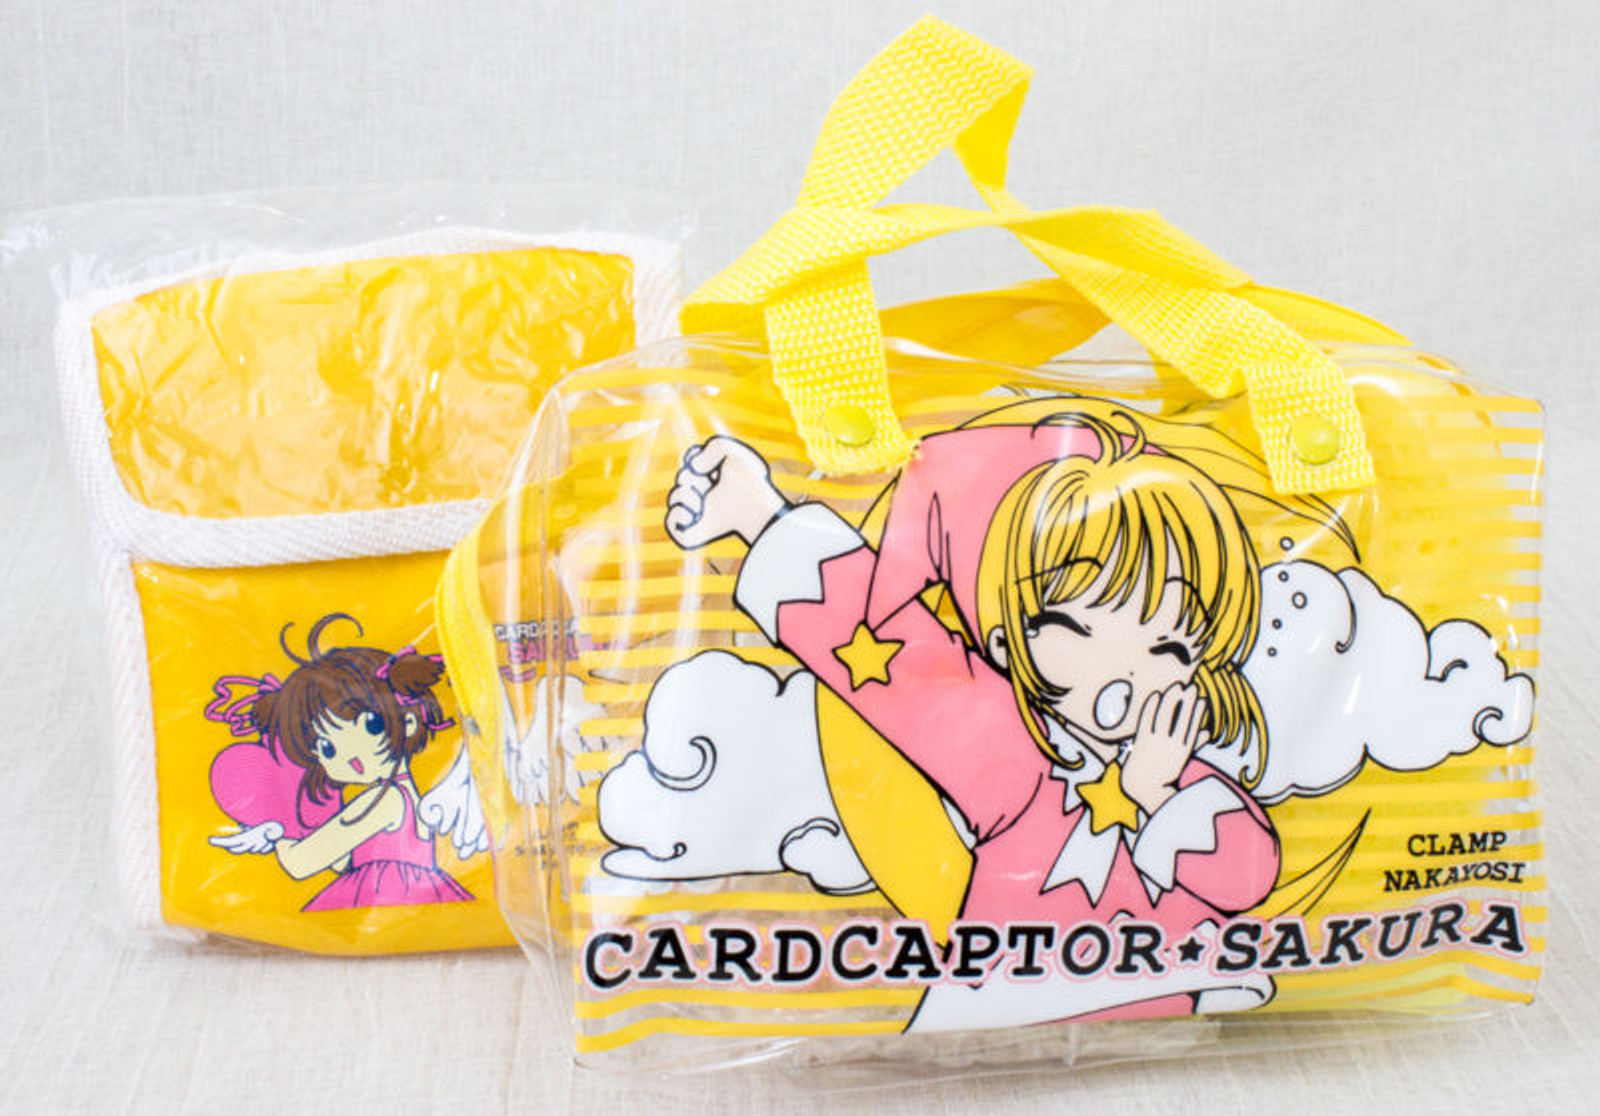 Cardcaptor Sakura Mini Bag Pouch Toiletries Goods Towel CLAMP JAPAN ANIME MANGA